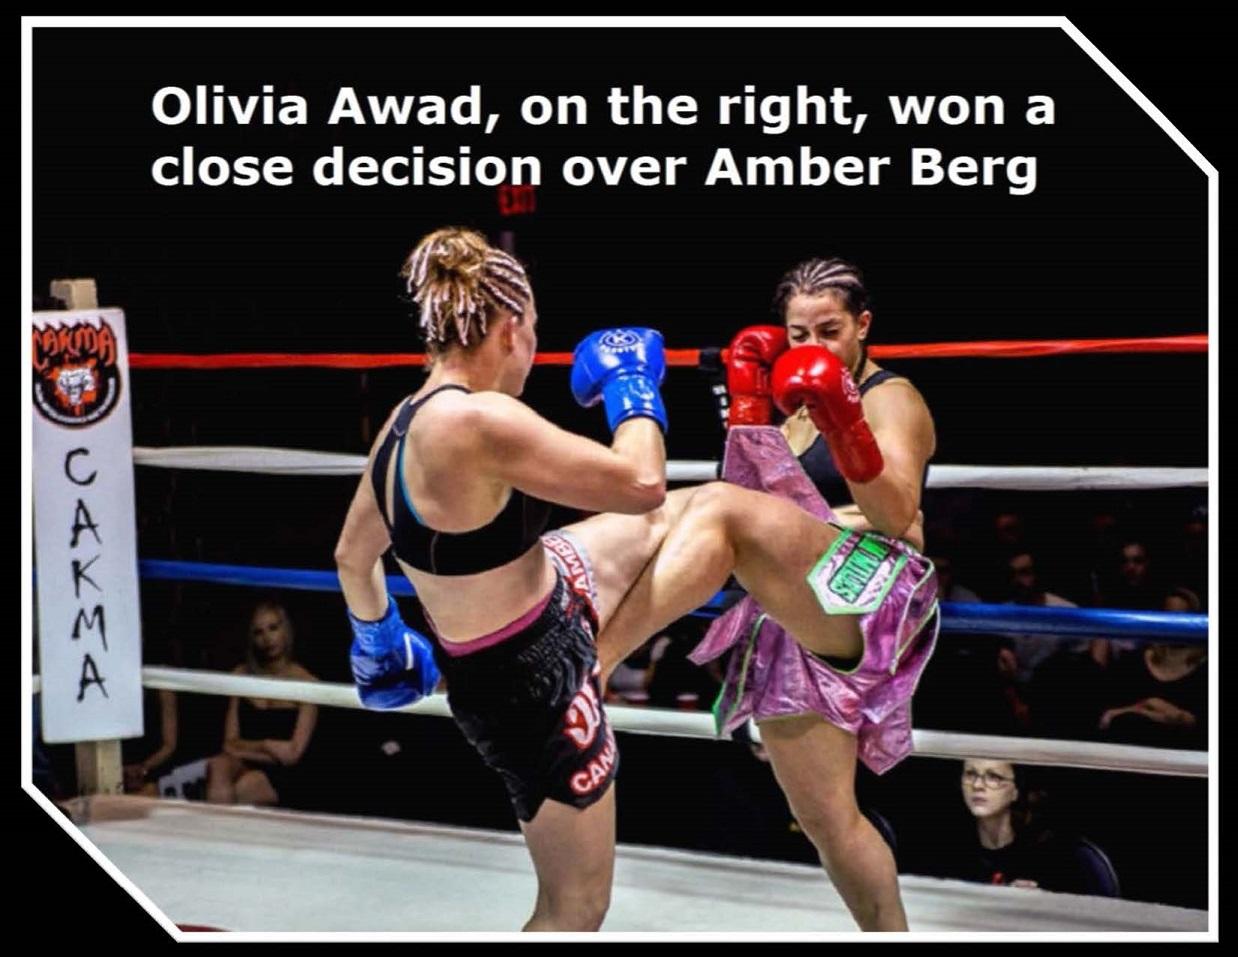 Awad vs. Berg